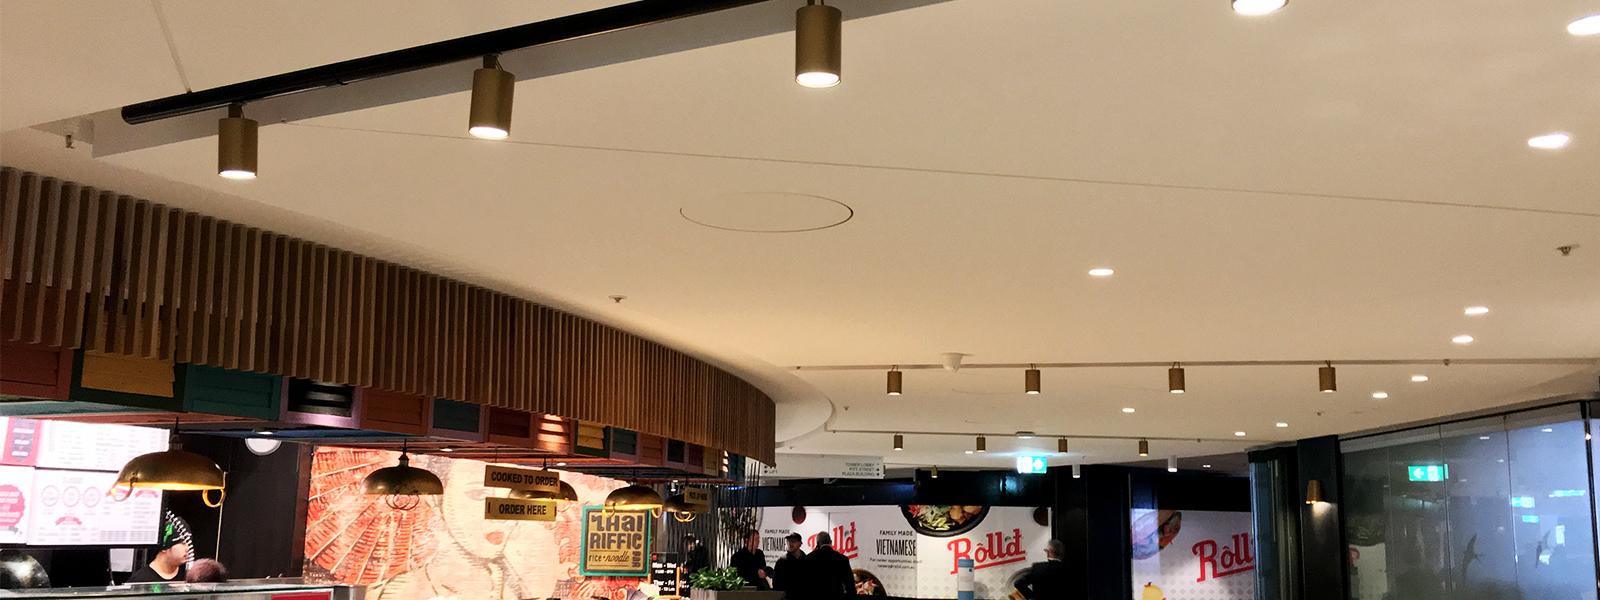 Australia Square Food Court, Sydney